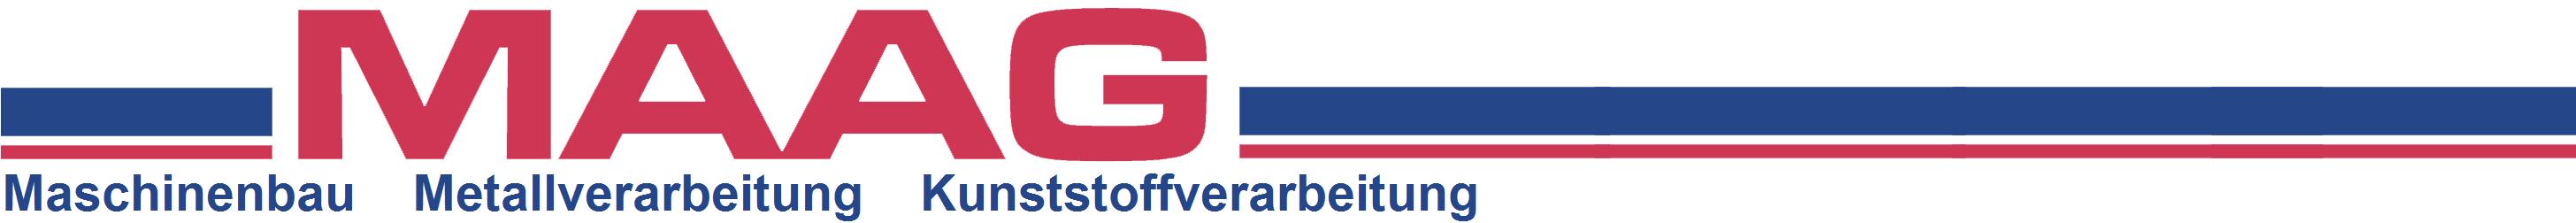 Maag GmbH Logo